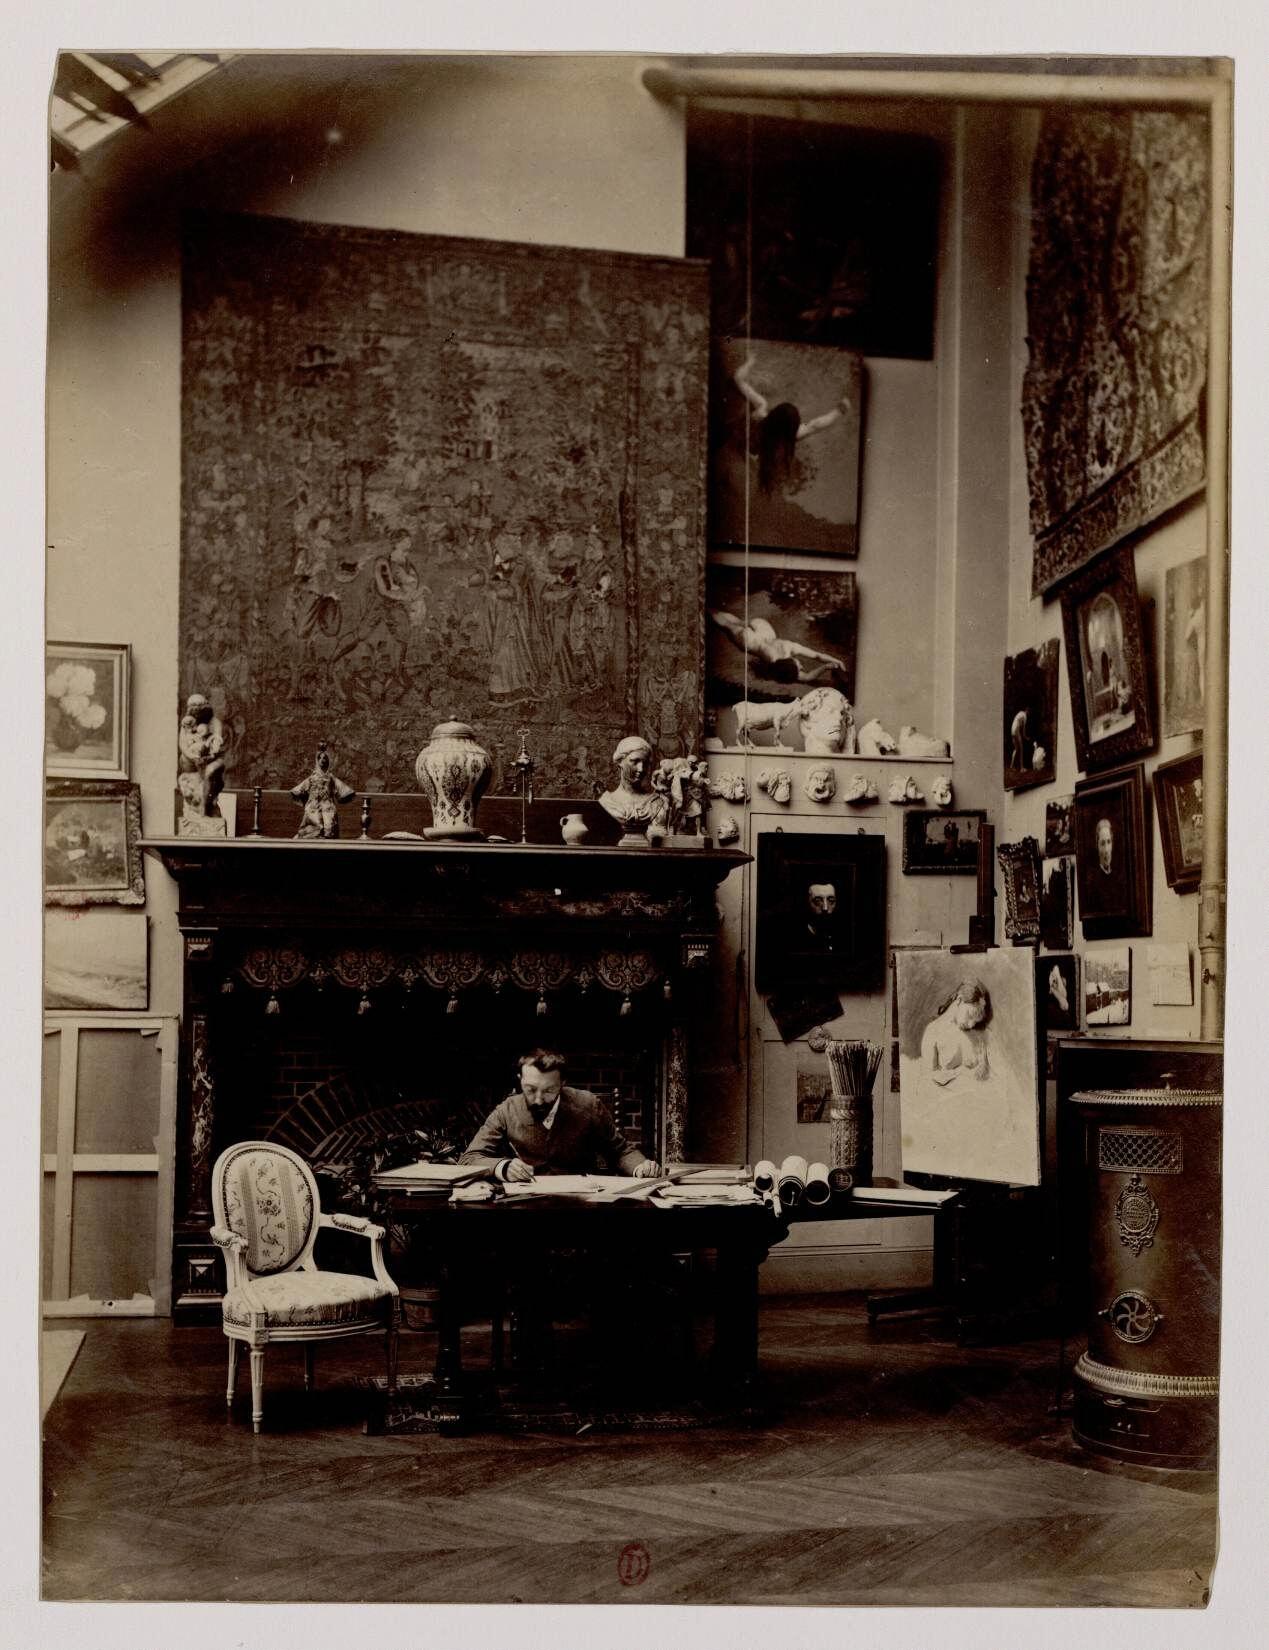 Жан Андре Риксен (1846-1924) - французский художник